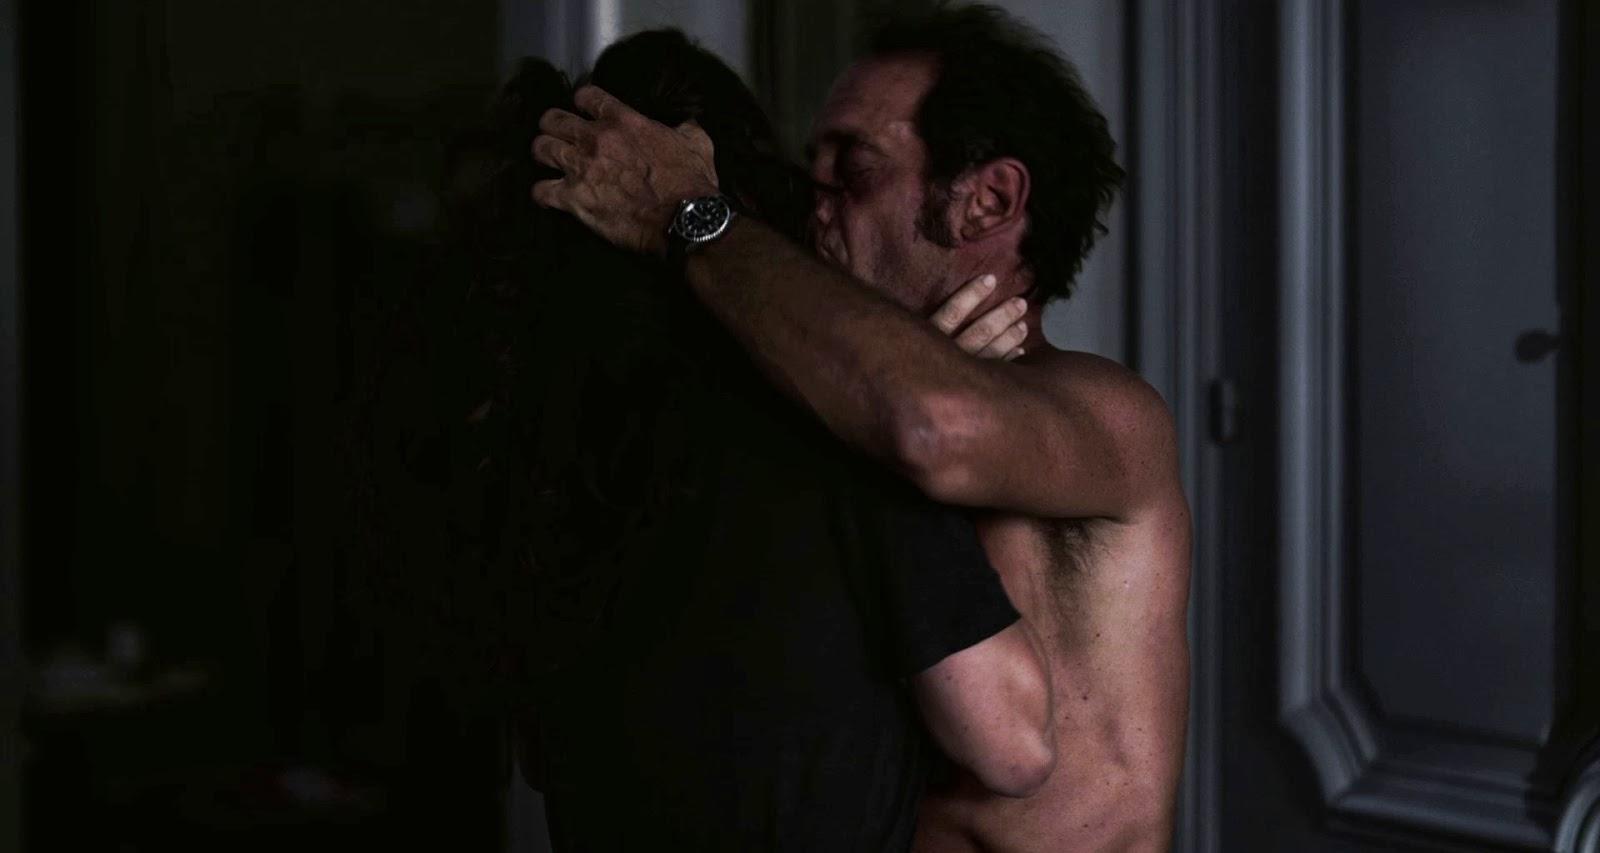 New York Film Festival 2013: Bastards Review